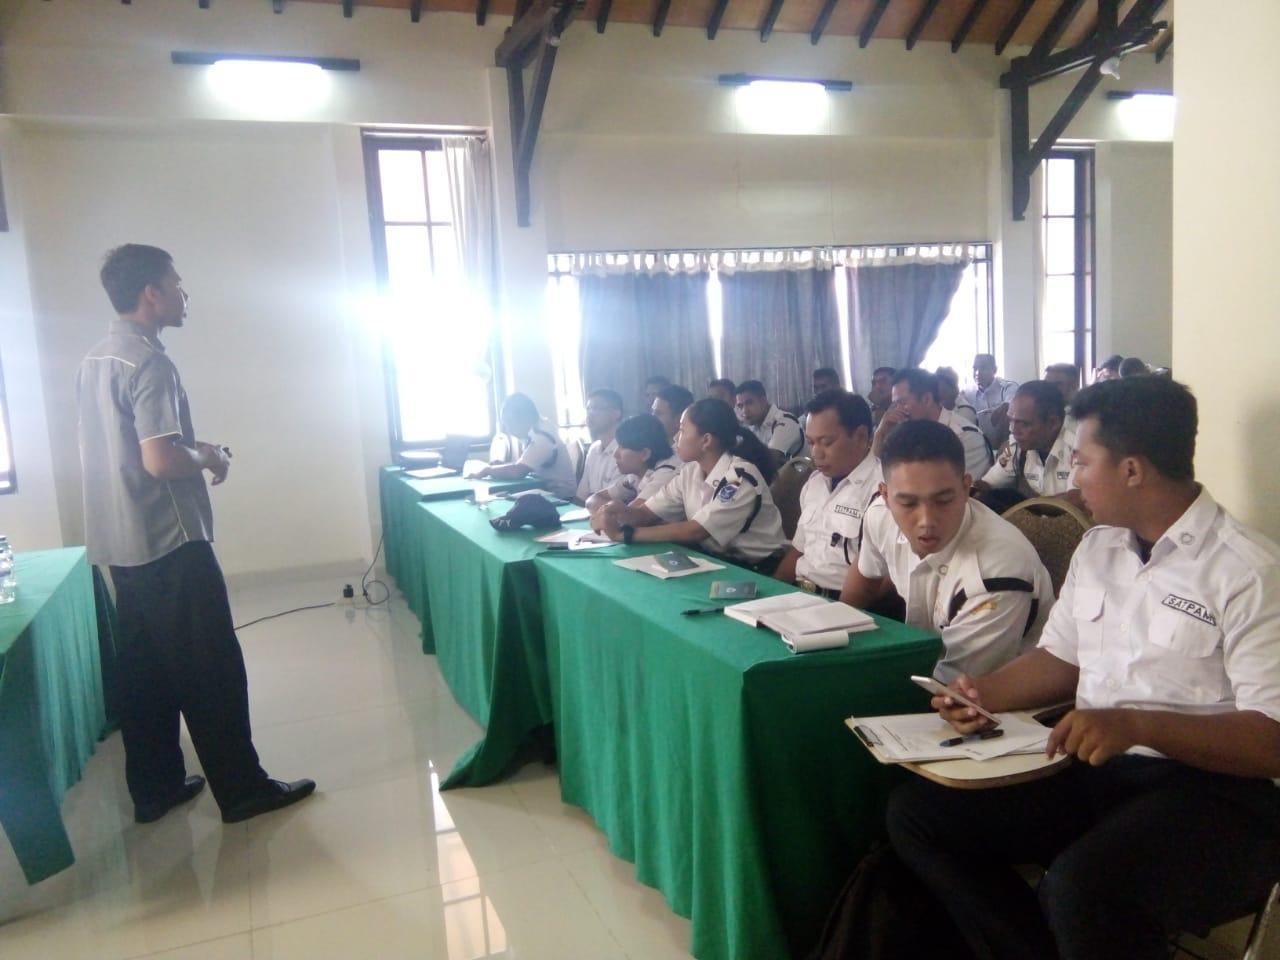 Materi Prinsip-Prinsip Satpam dari Bpk. Darmawan Putra staff ASTAcademy